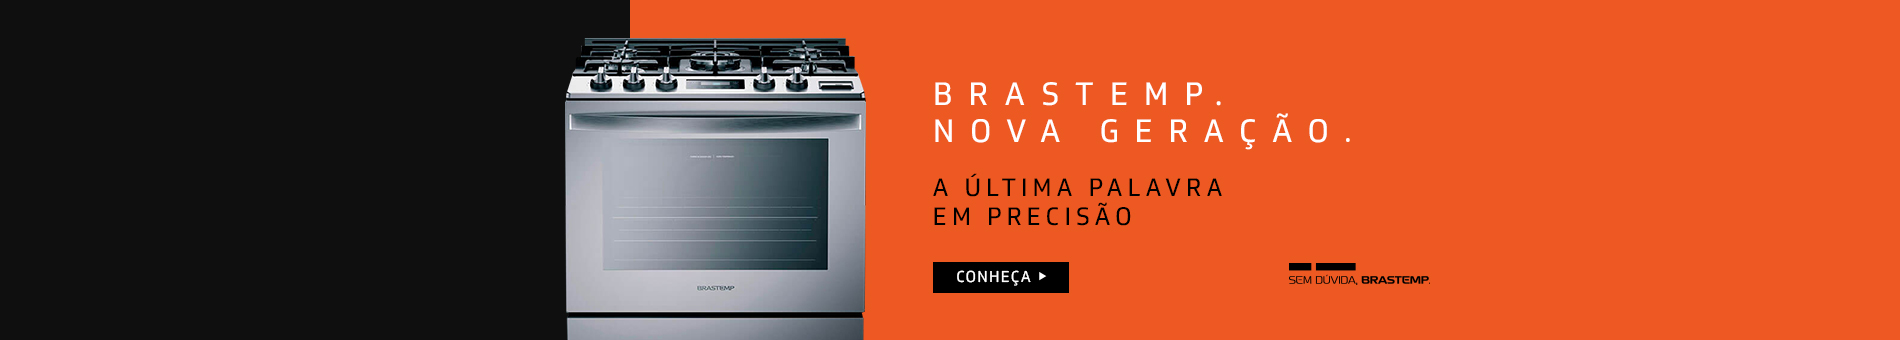 Promoção Interna - 2325 - brastemp_novageracao-fogoes_19062018_home2 - novageracao-fogoes - 2